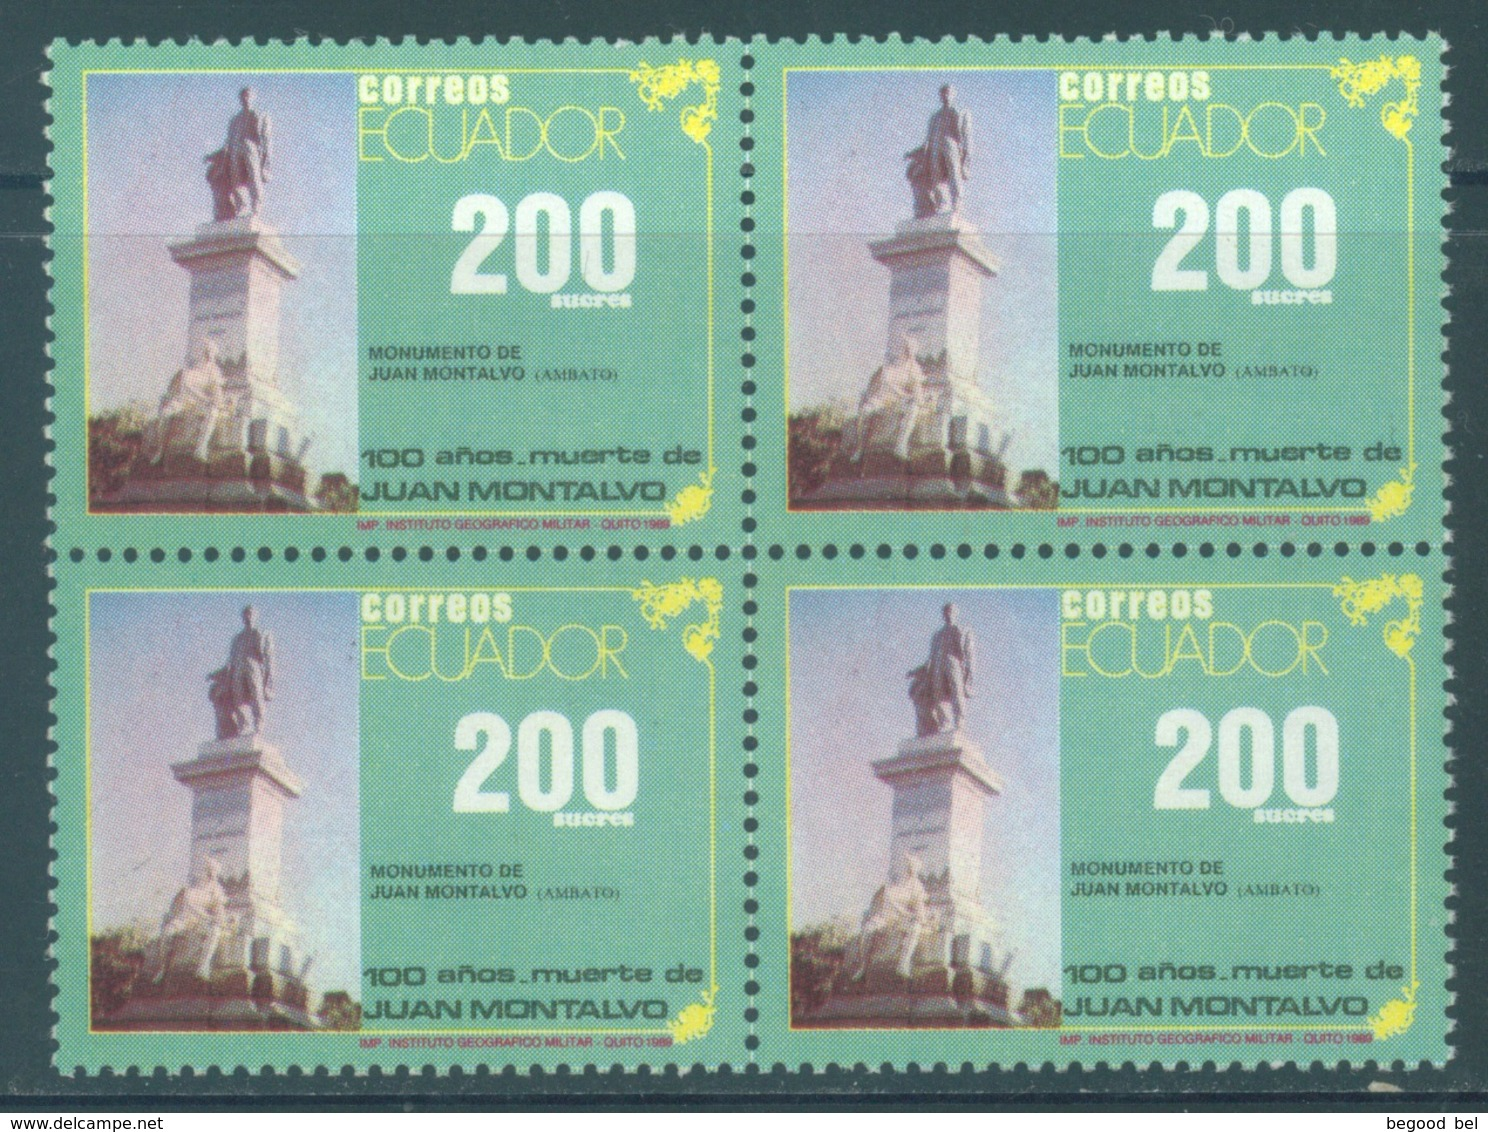 ECUADOR - MNH/** - 1989 - JUAN MONTALVO BLOC OF 4 STAMPS - Yv 1194 -  Lot 18453 - Equateur